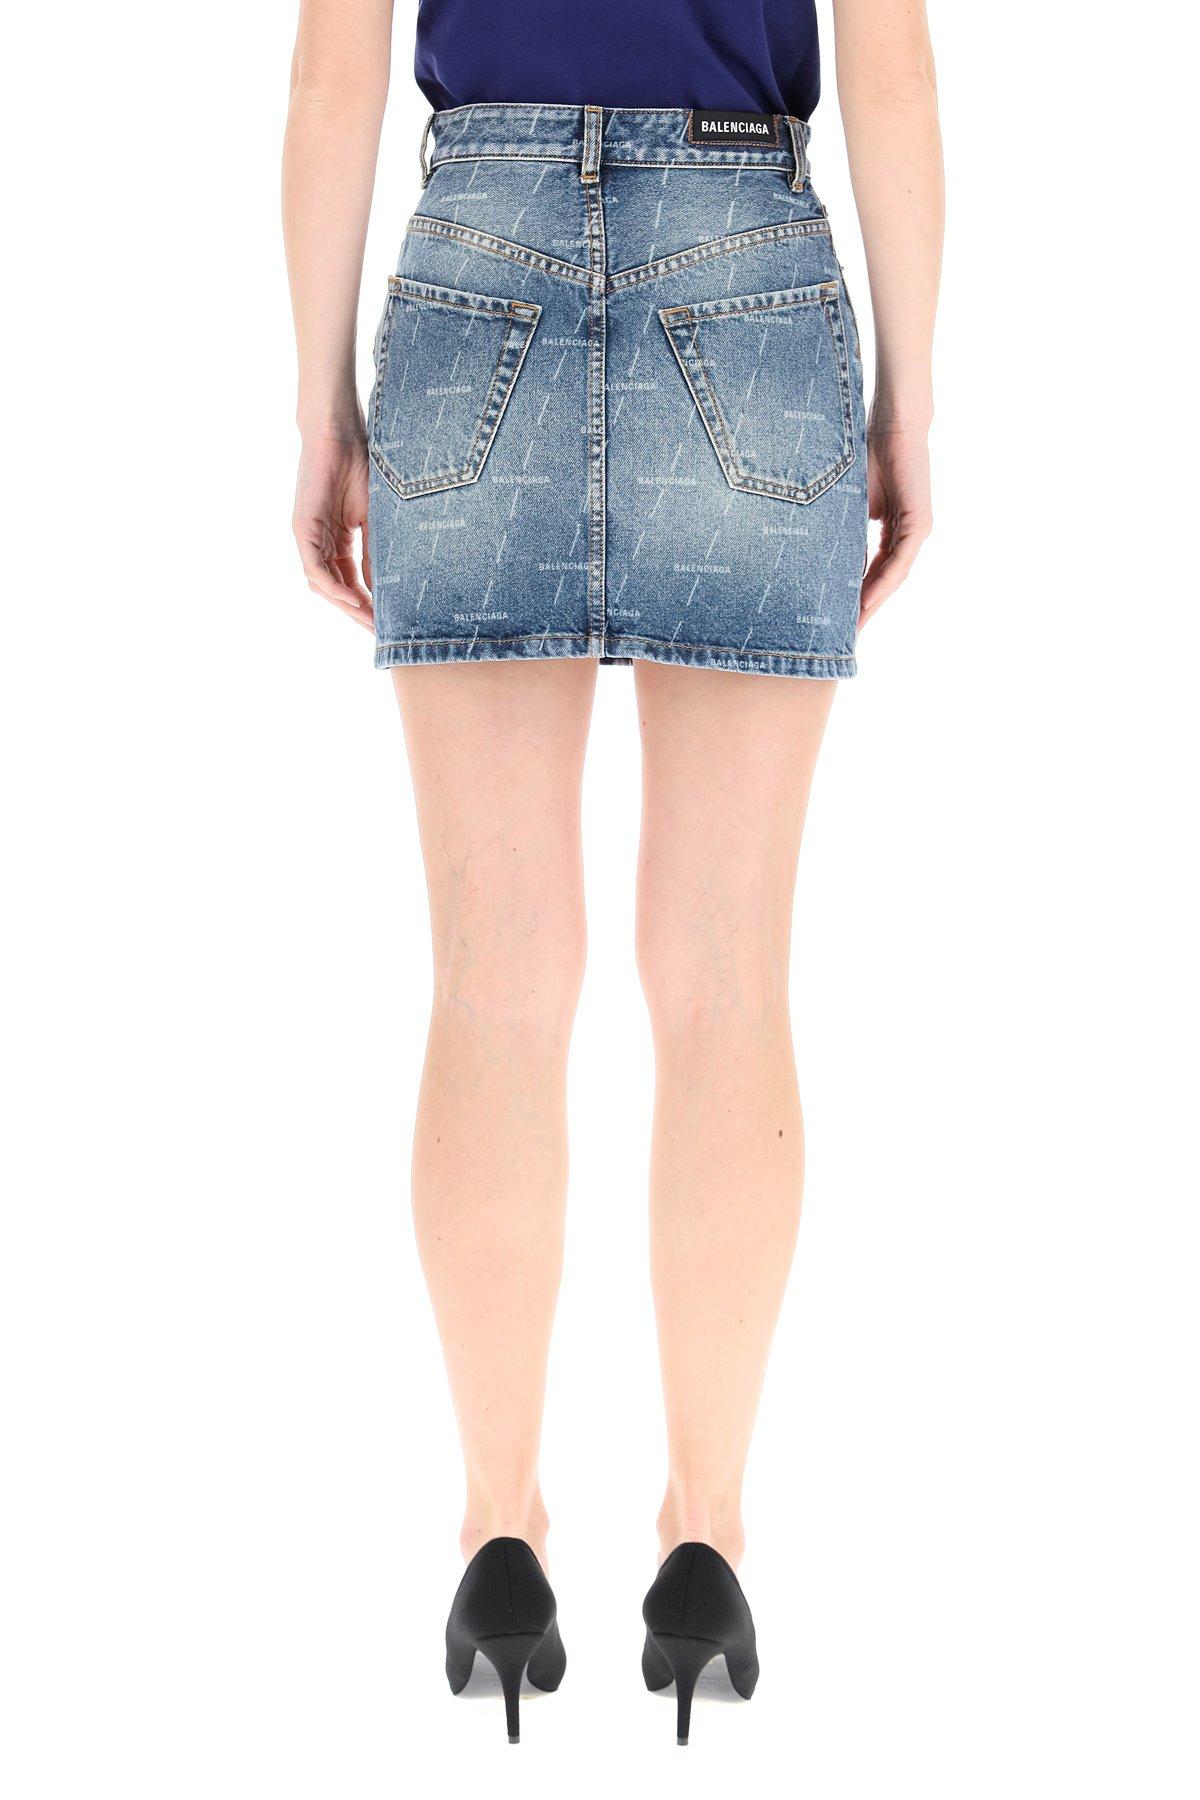 Balenciaga minigonna denim con logo lavorato al laser